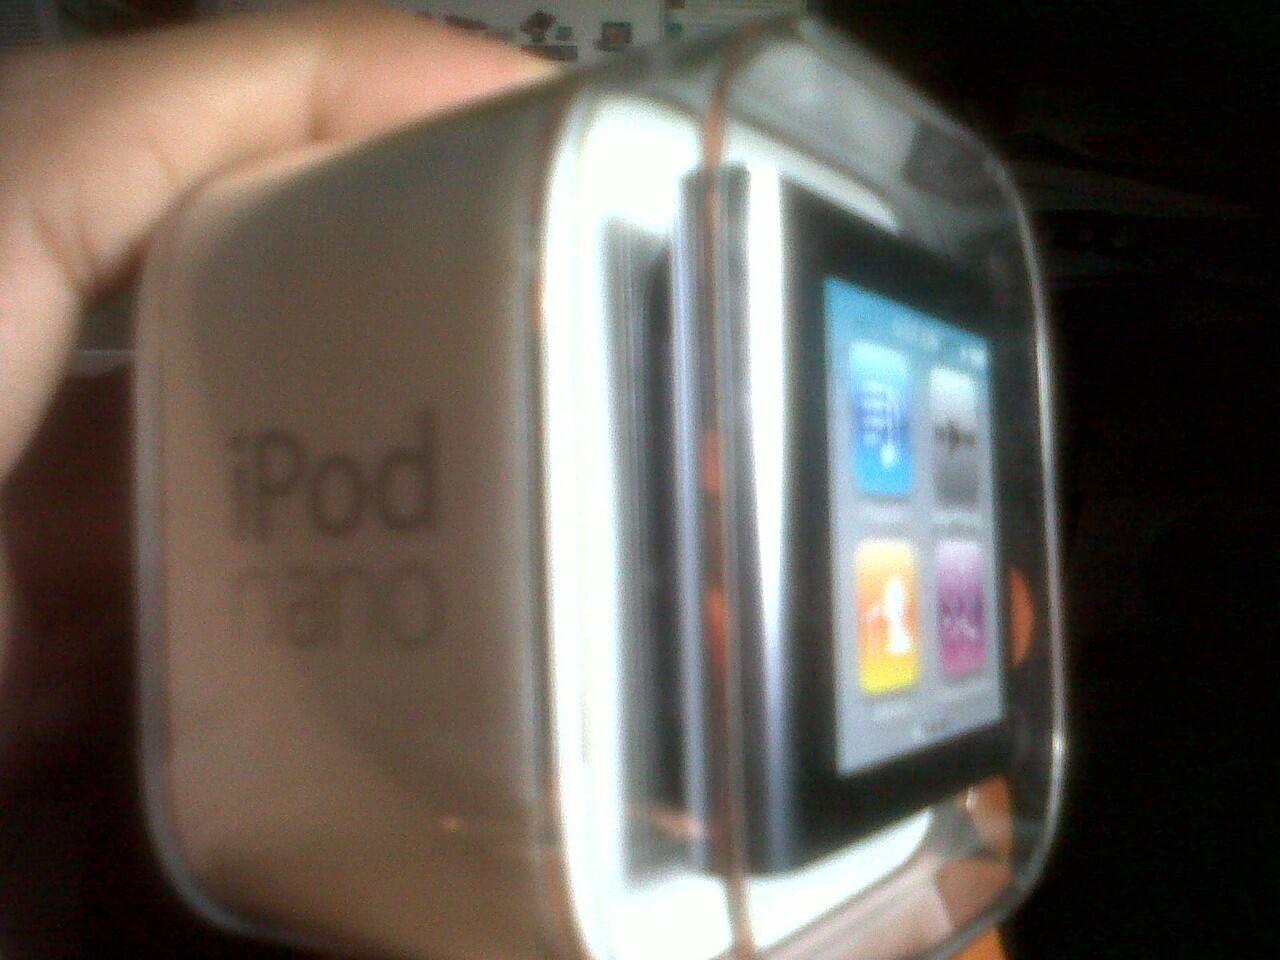 JUAL APPLE iPod NANO 16 GB